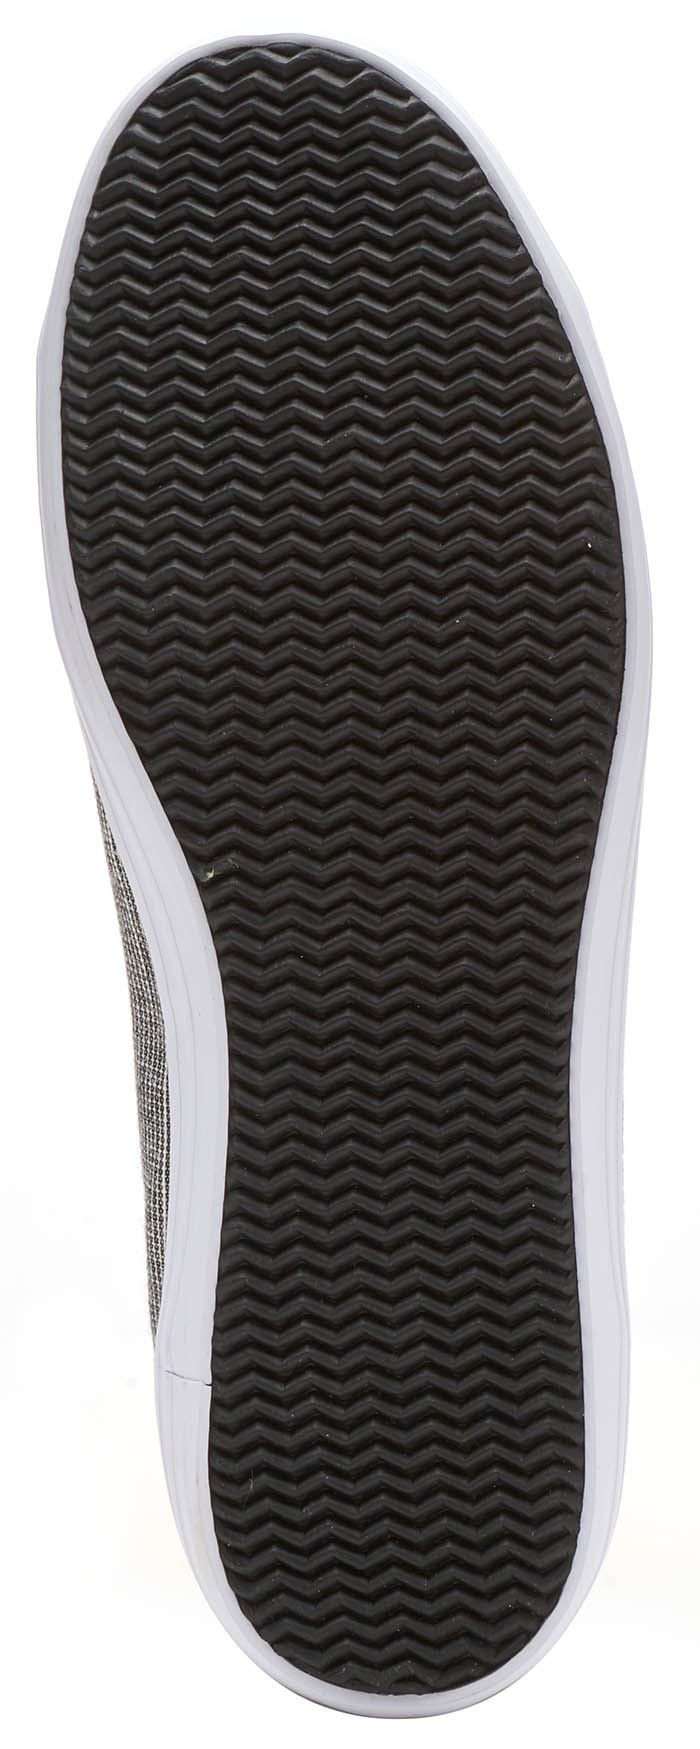 Lacoste Ziane Chunky Toile & Cuir Slip Slip Slip On Baskets en Noir, Bleu Marine & Blanc 861638